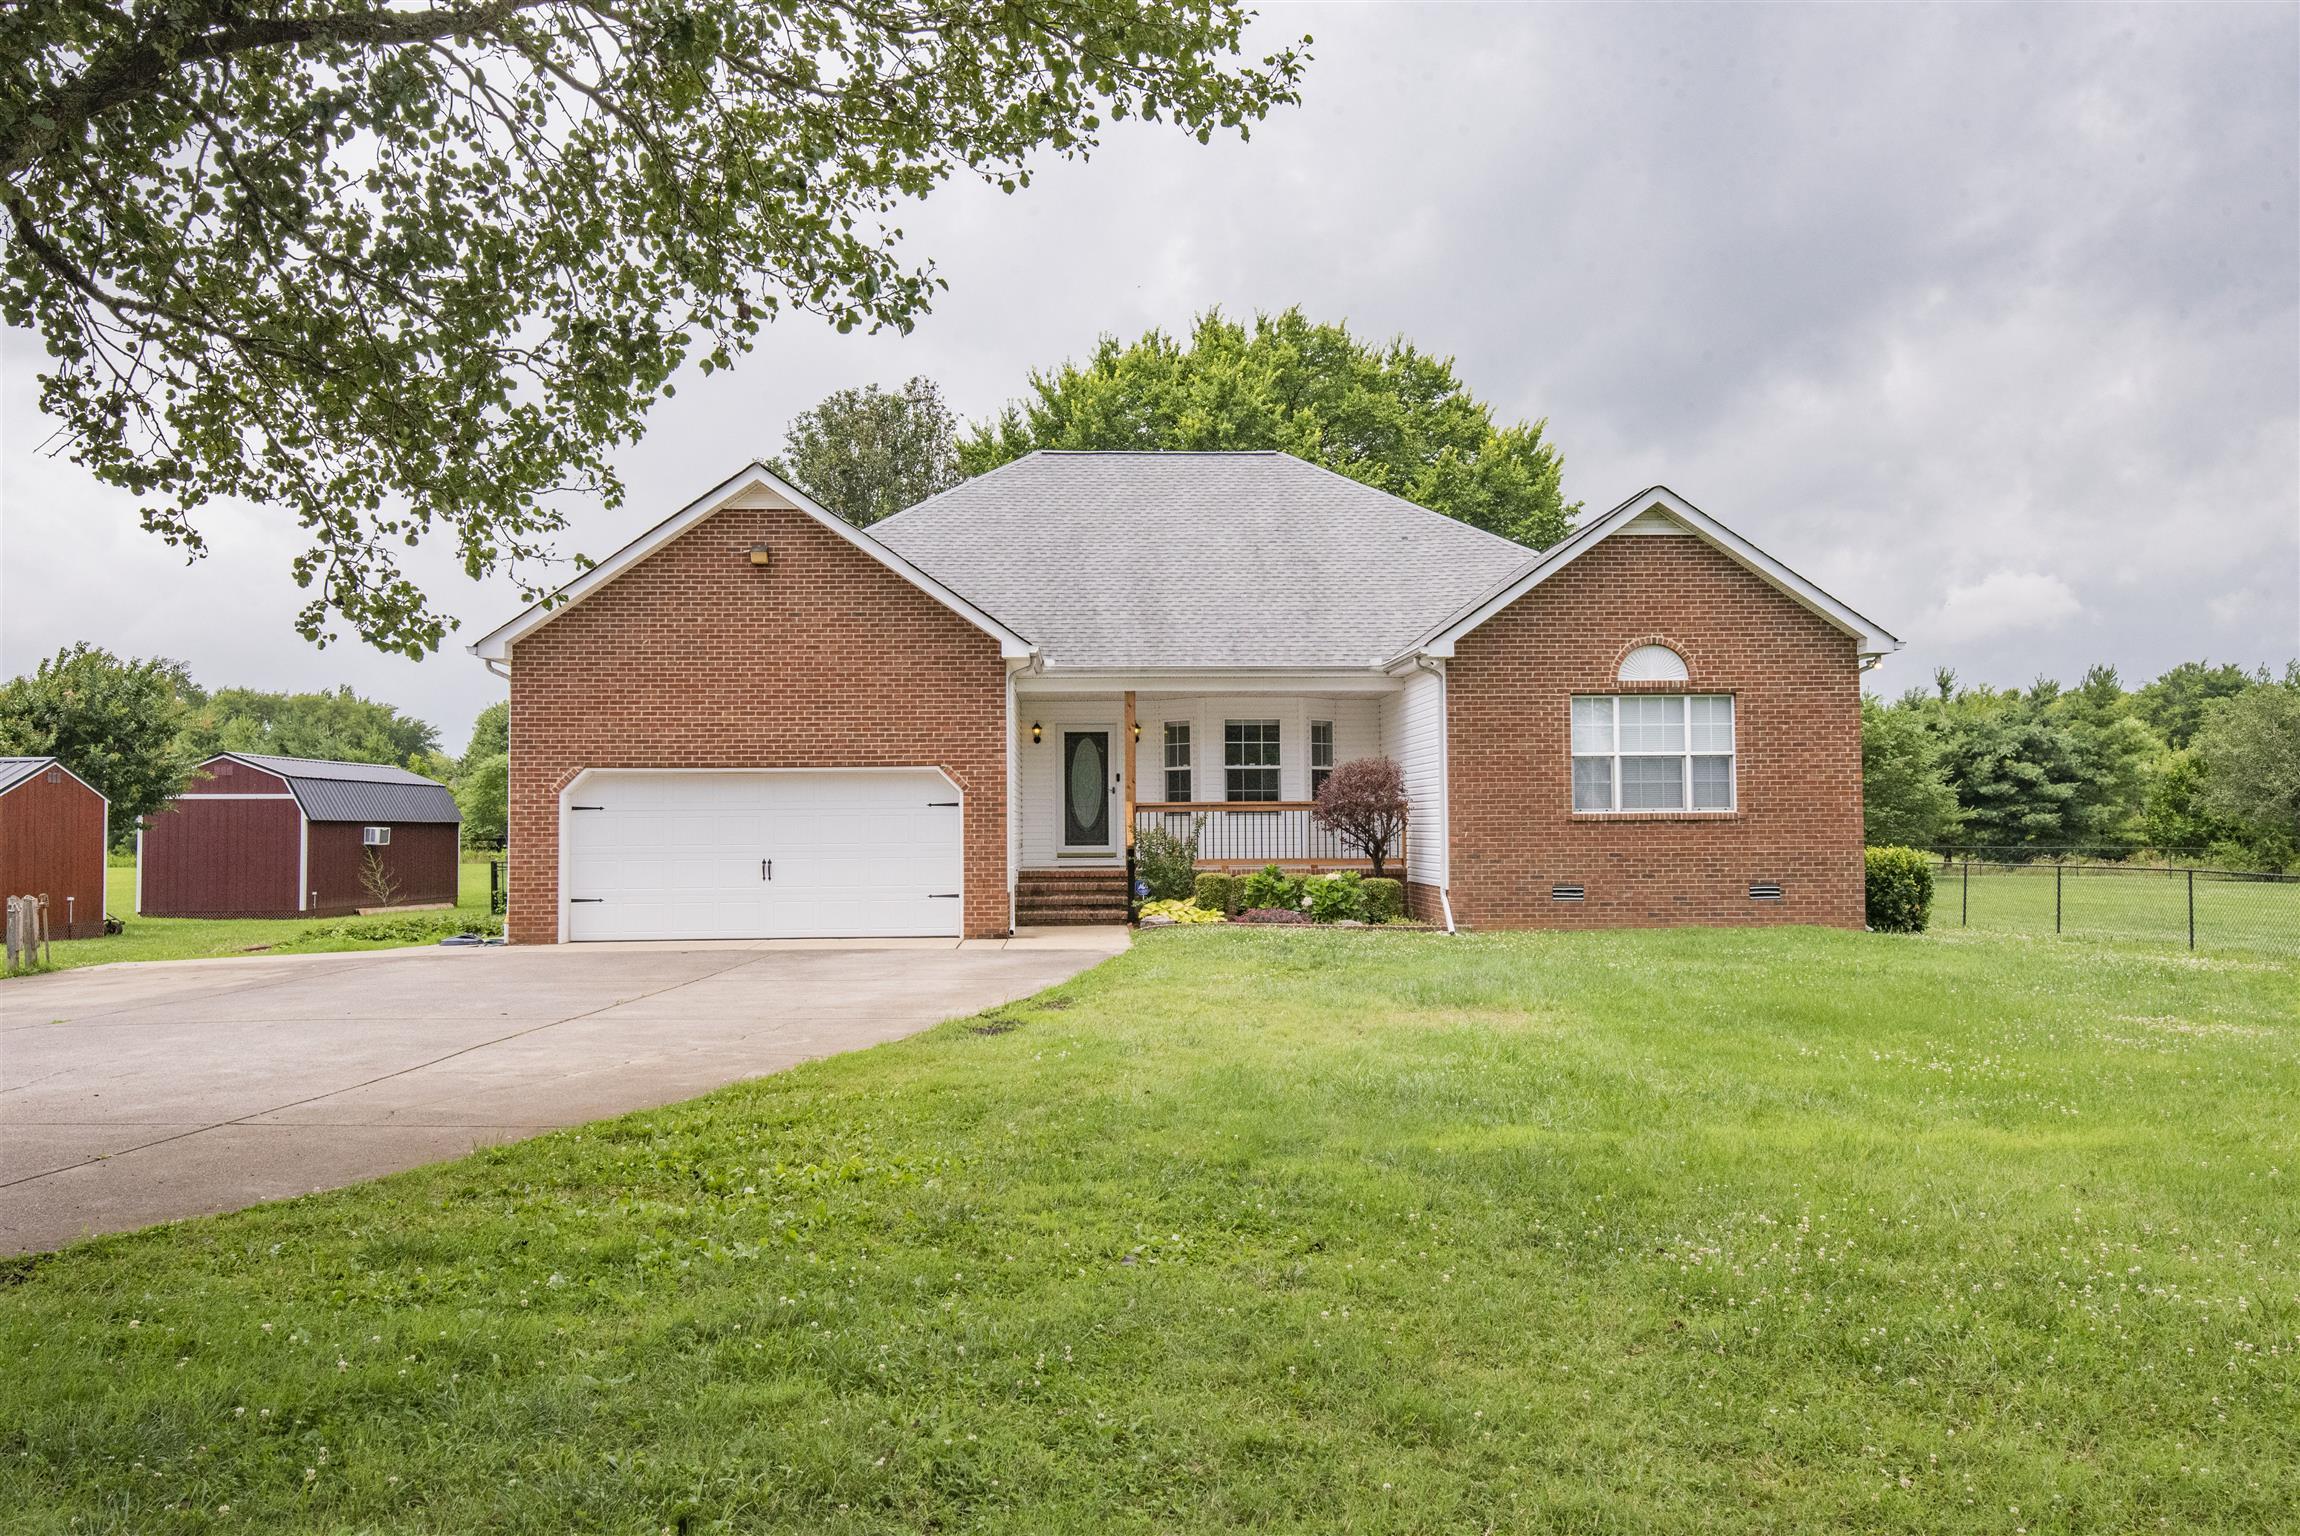 4832 Manchester Pike, Murfreesboro, TN 37127 - Murfreesboro, TN real estate listing